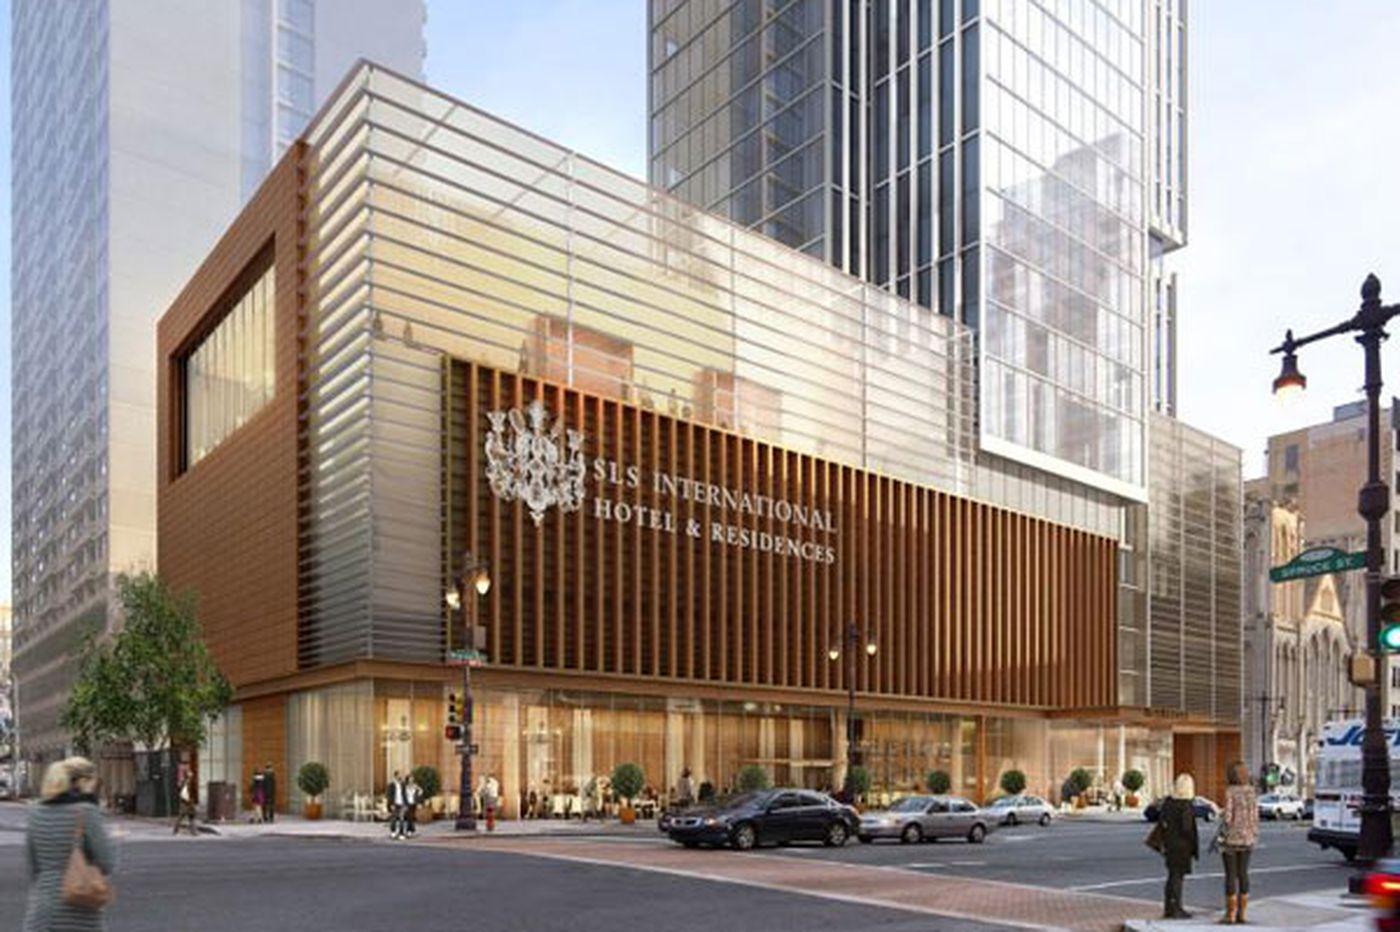 Demolition of Philadelphia International Records building underway